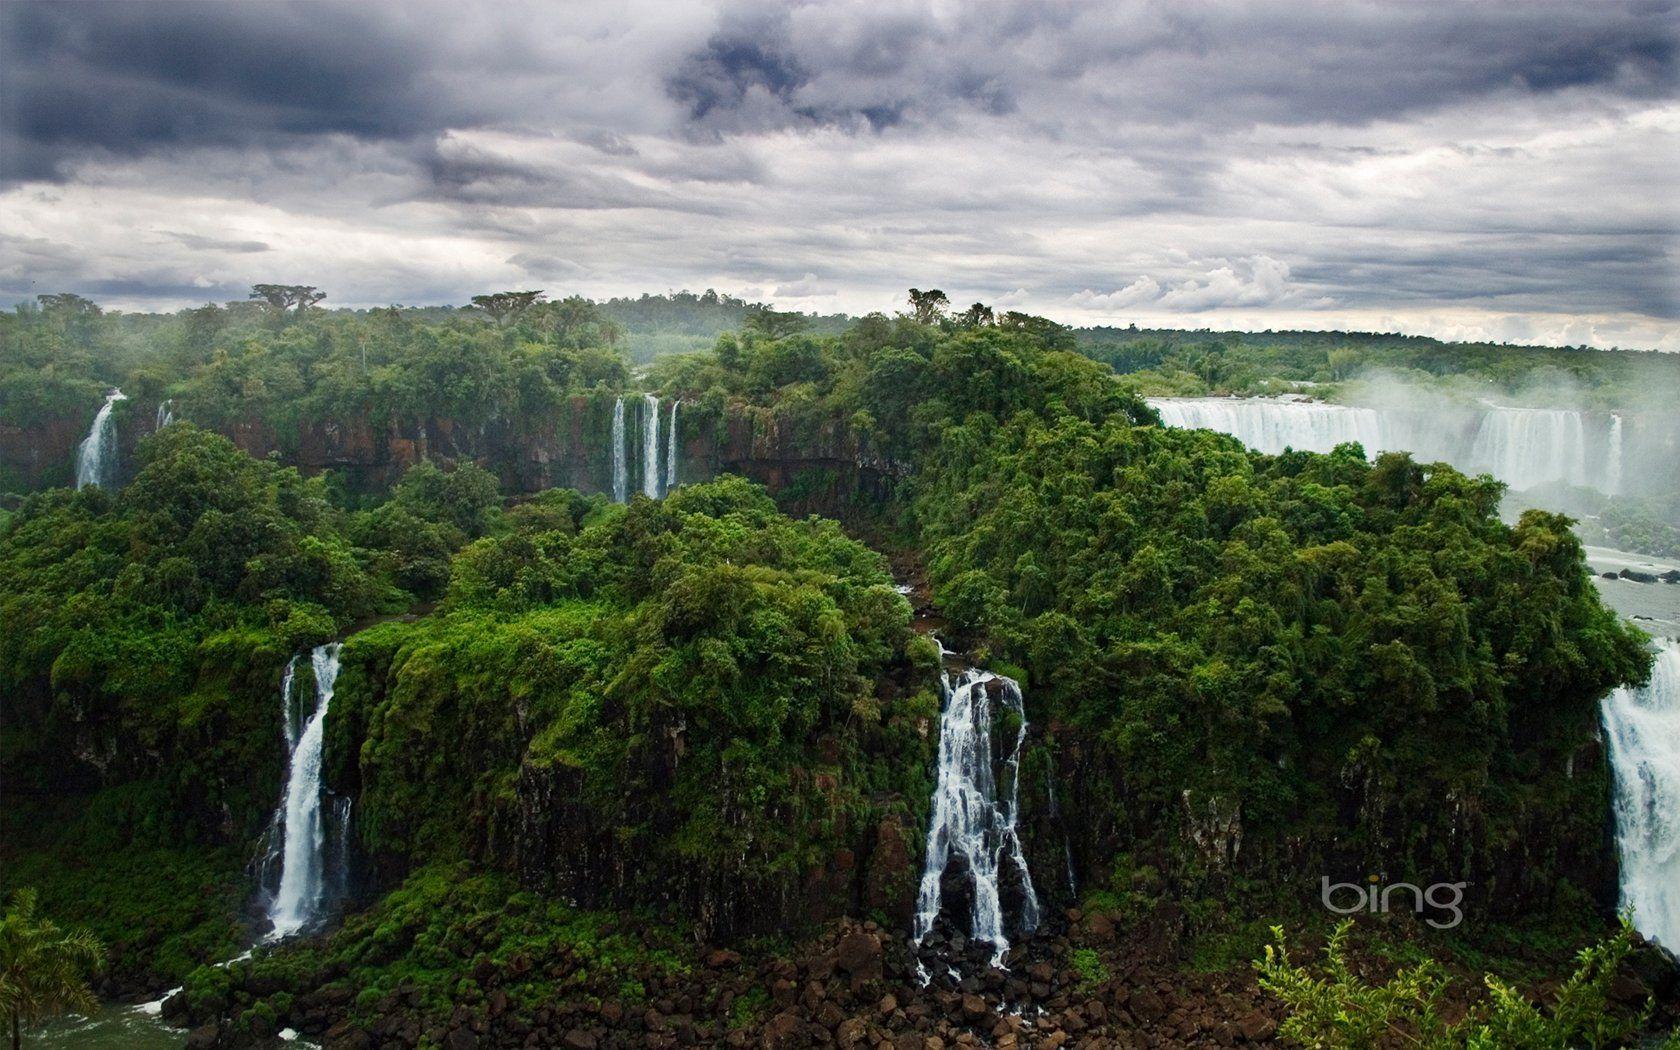 Brazil Landscape Wallpapers Top Free Brazil Landscape Backgrounds Wallpaperaccess